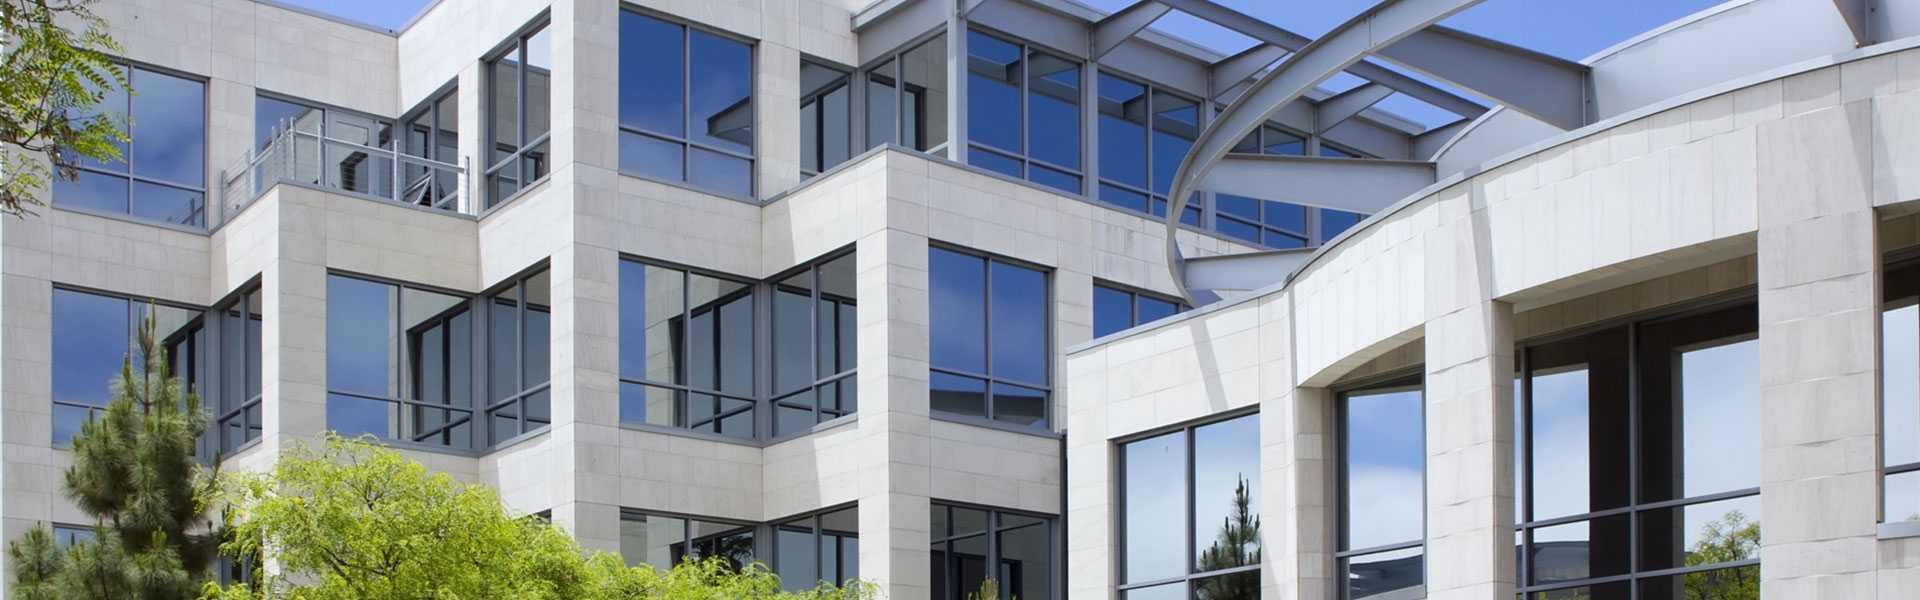 Accruent - Solutions - Facility Asset Management Software - Hero